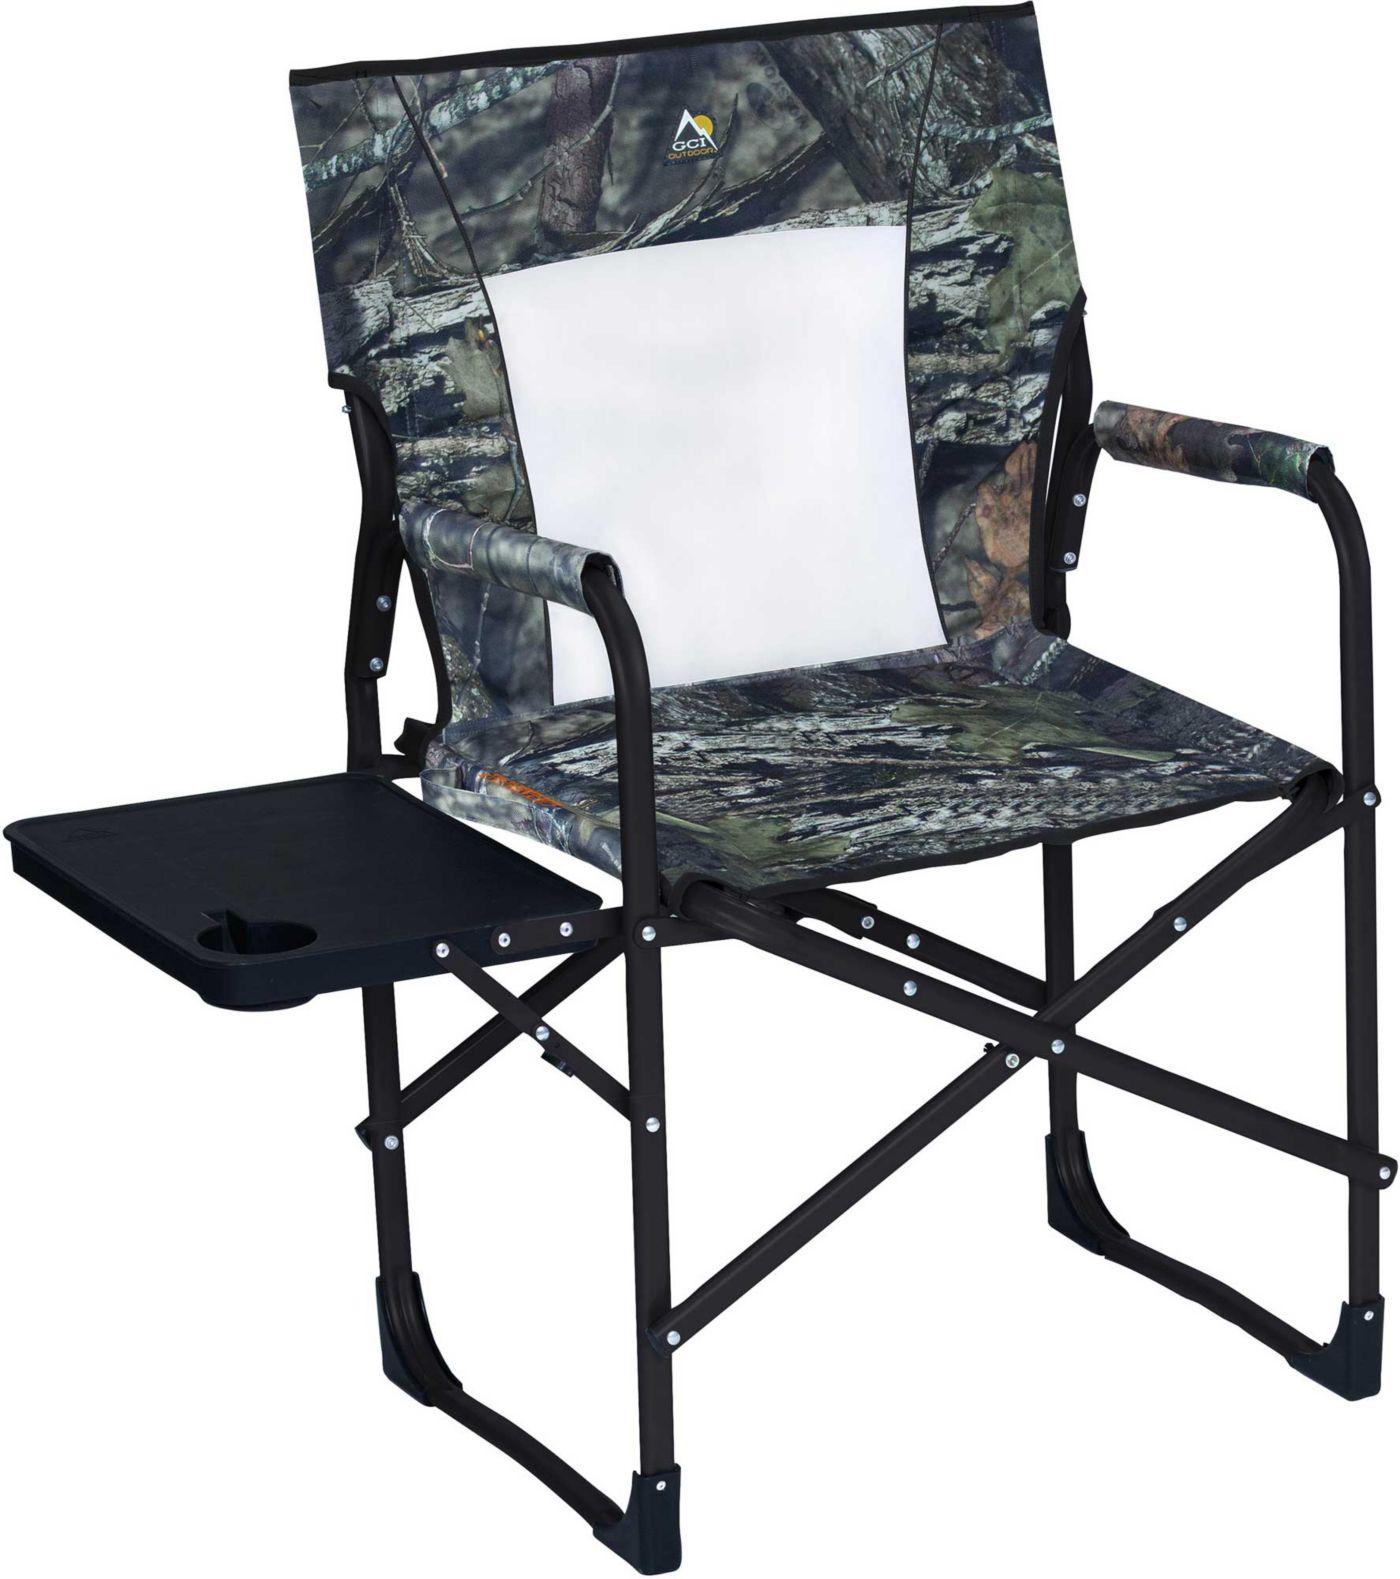 GCI Outdoor Camo Slim Fold Director's Chair